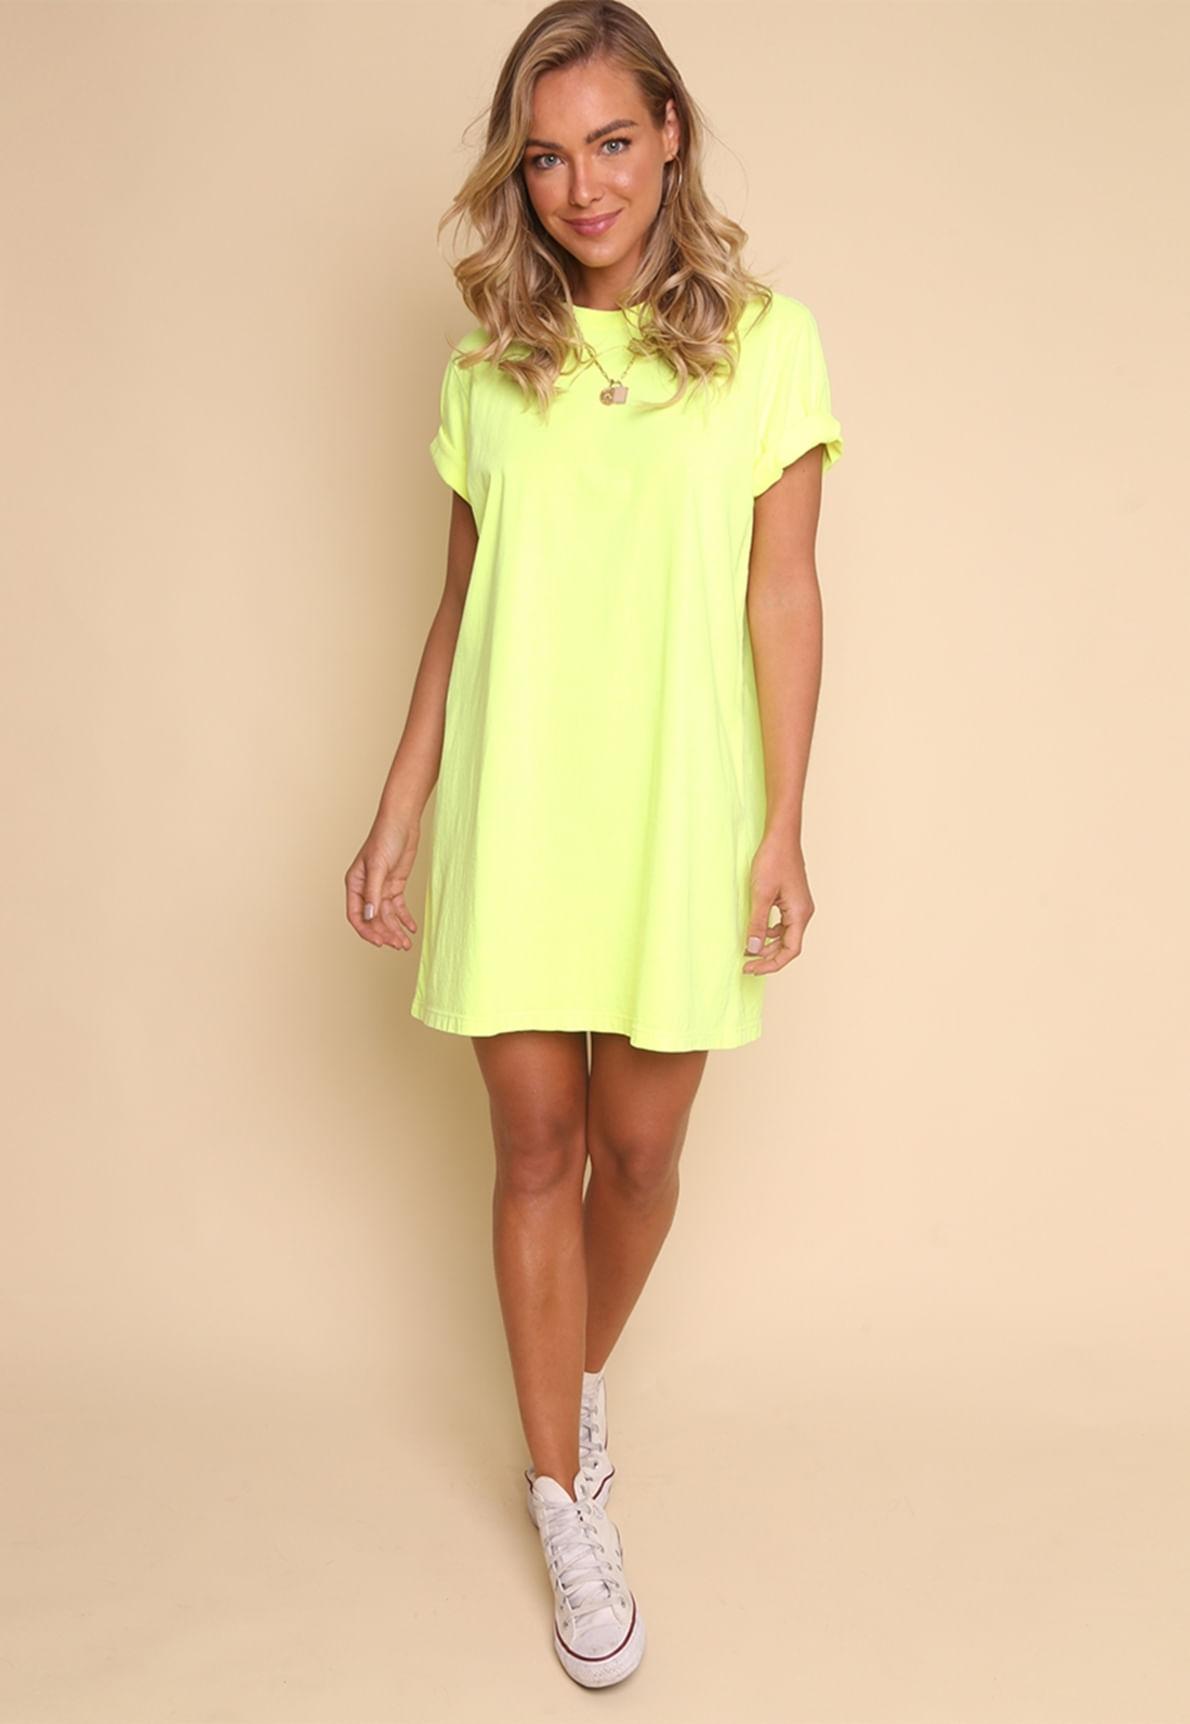 30363-vestido-camiseta-neon-california-days-mundo-lolita-01